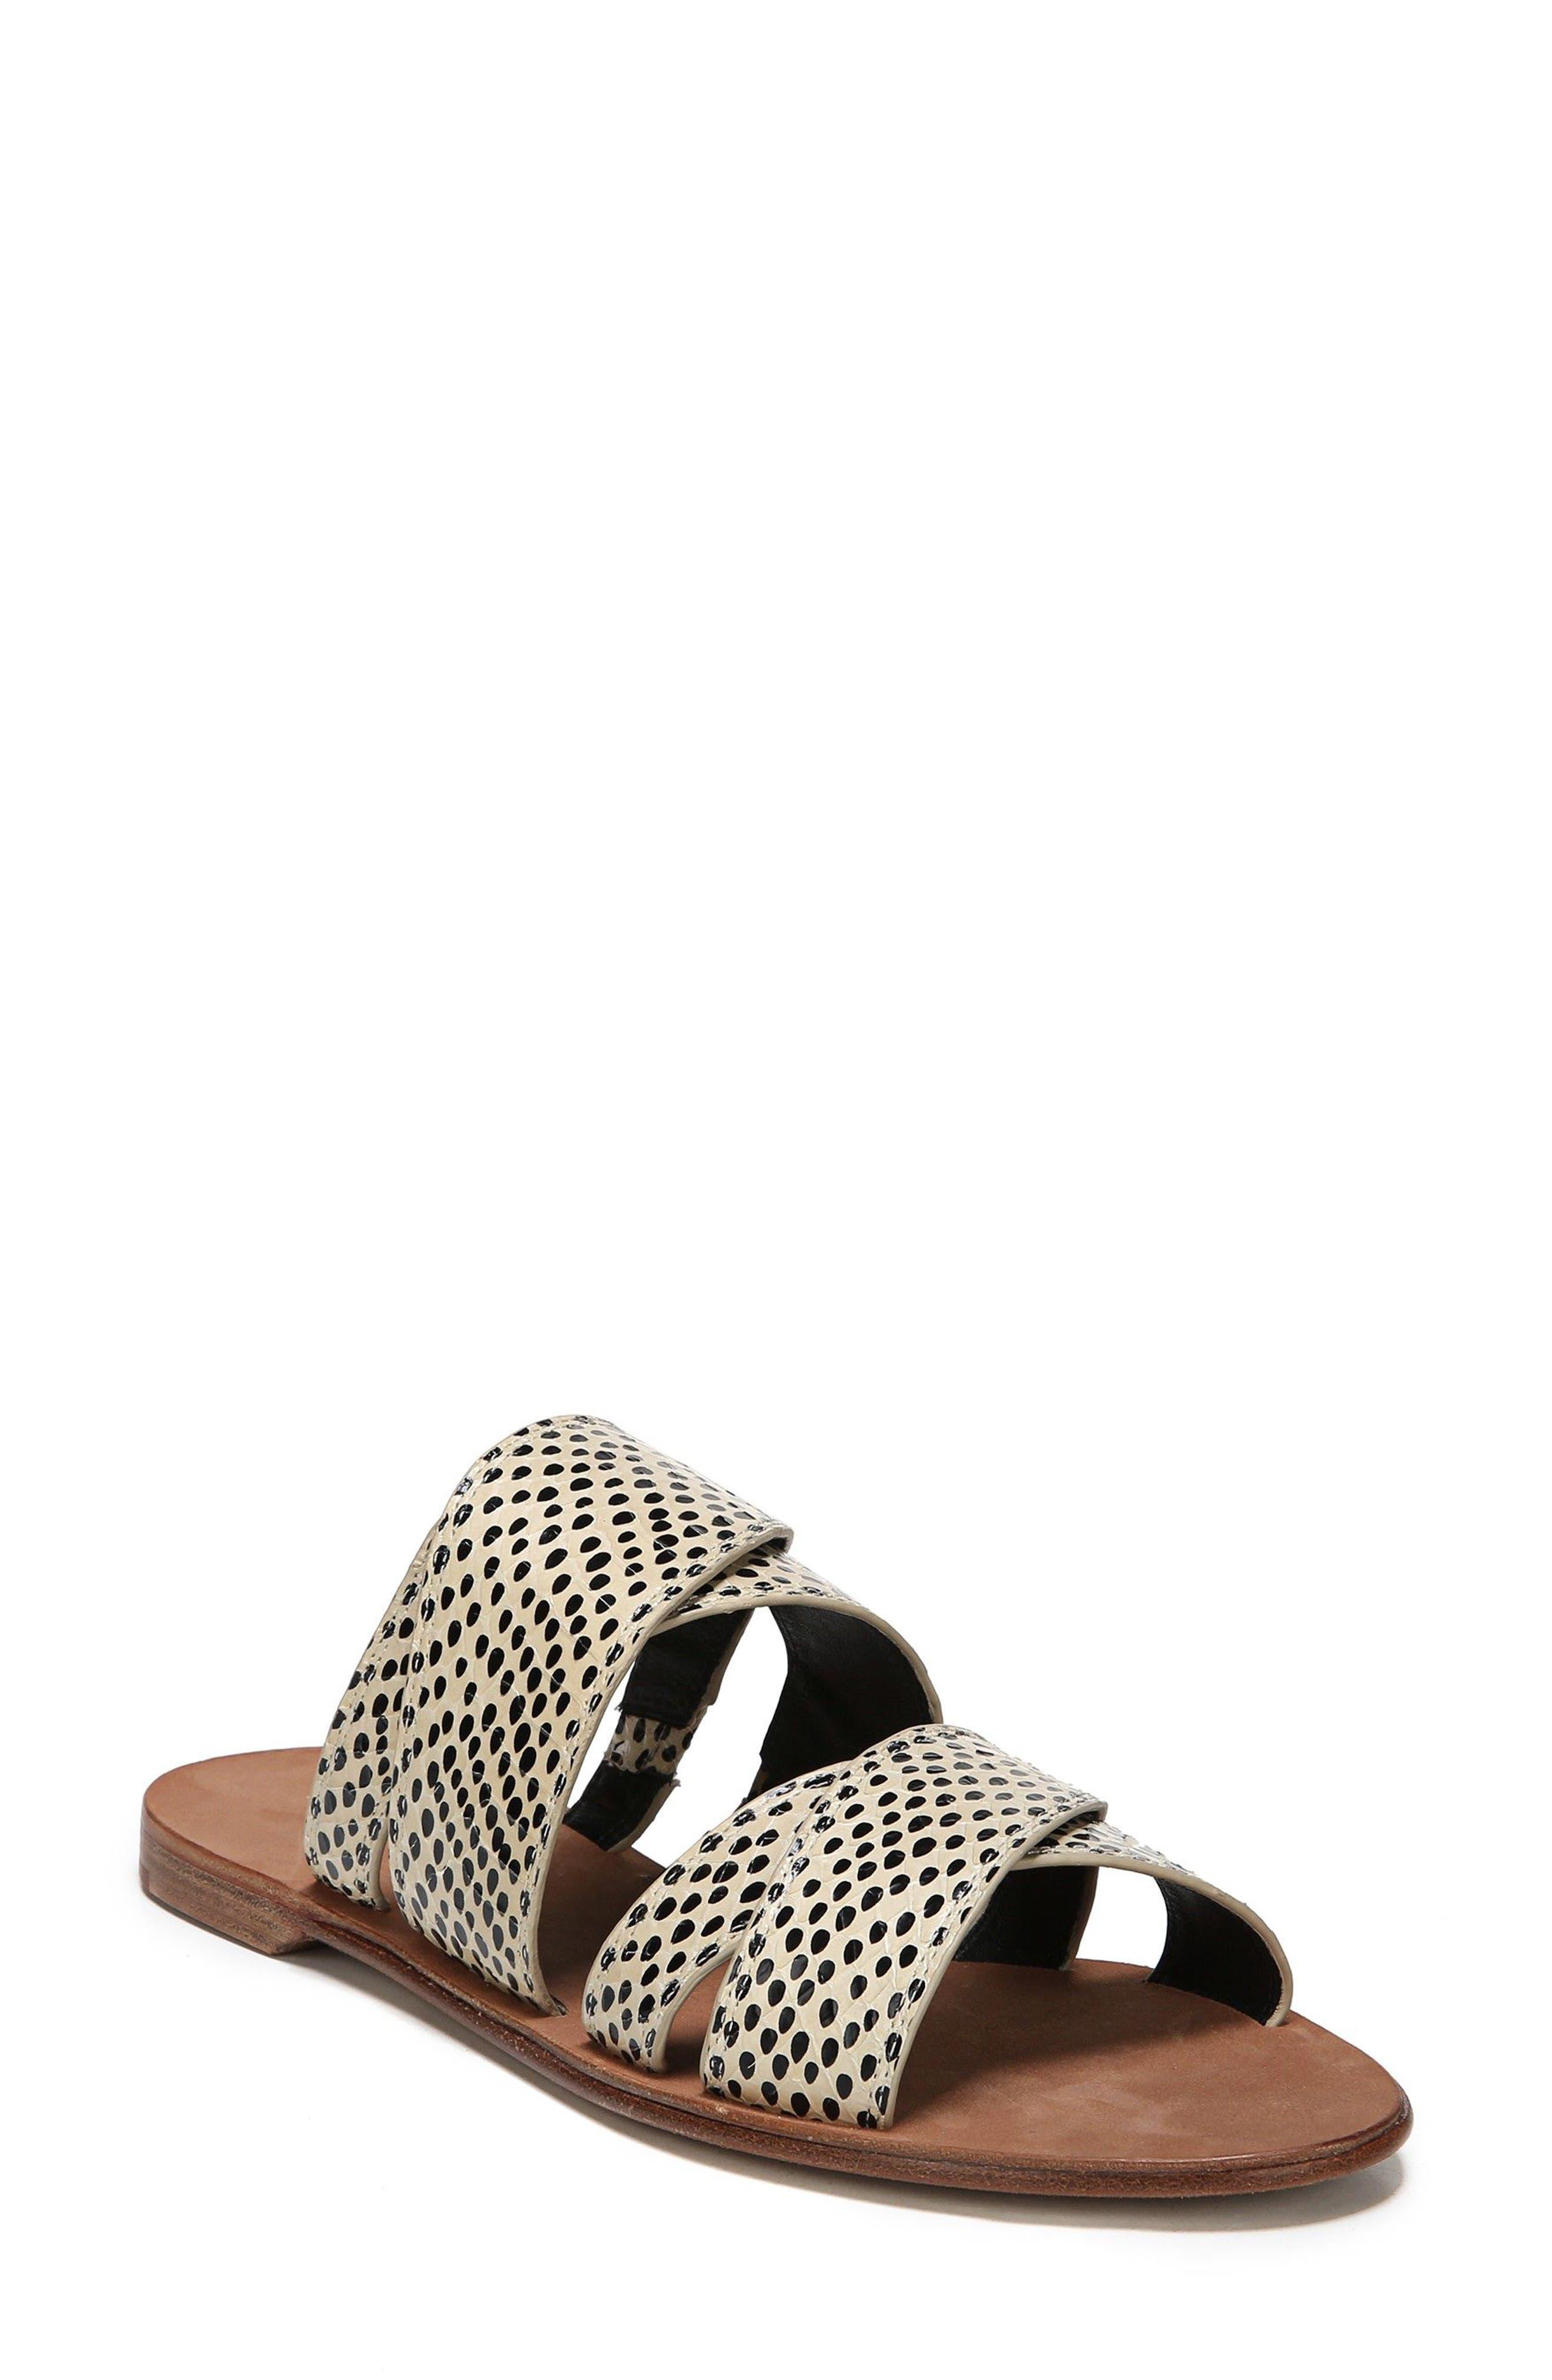 Blake Snakeskin Slide Sandal,                         Main,                         color, Black/Nude